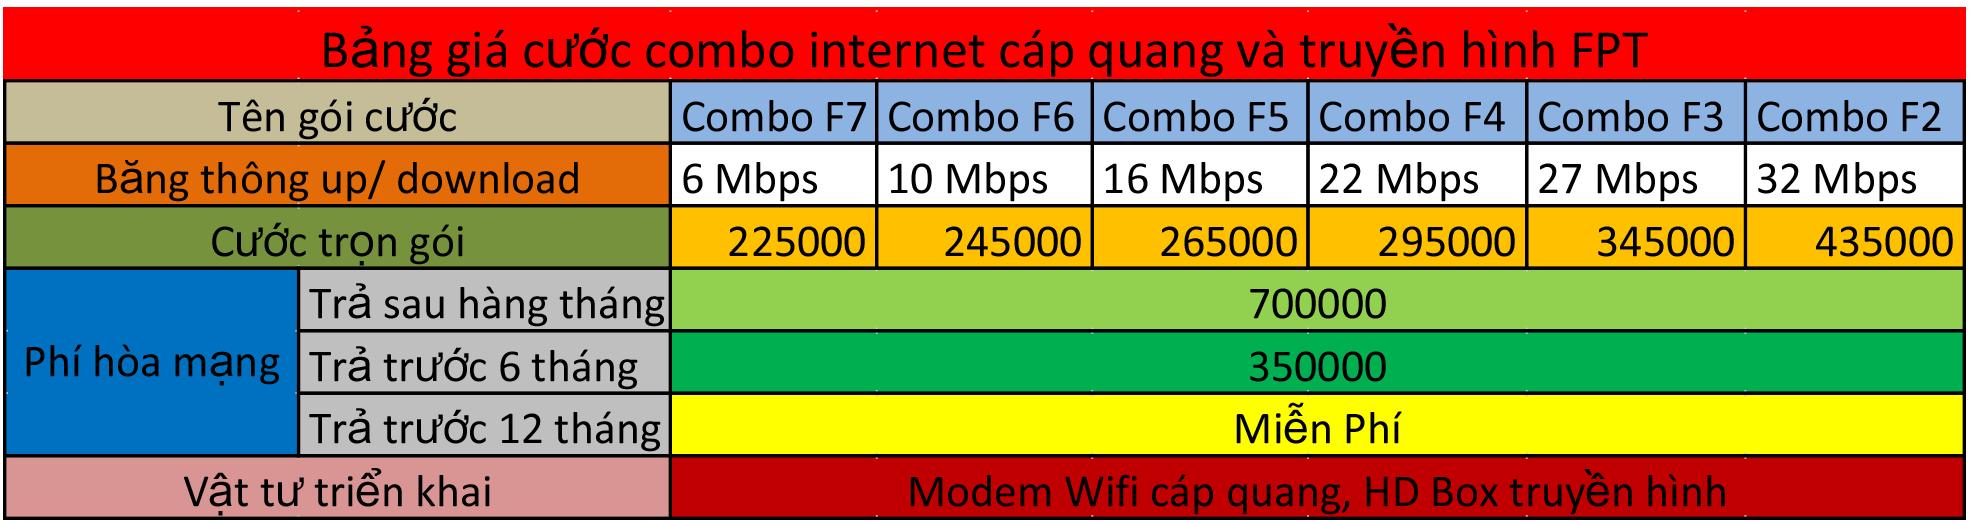 bao-gia-combo-internet-cap-quang-truyen-hinh-fpt-thang-9